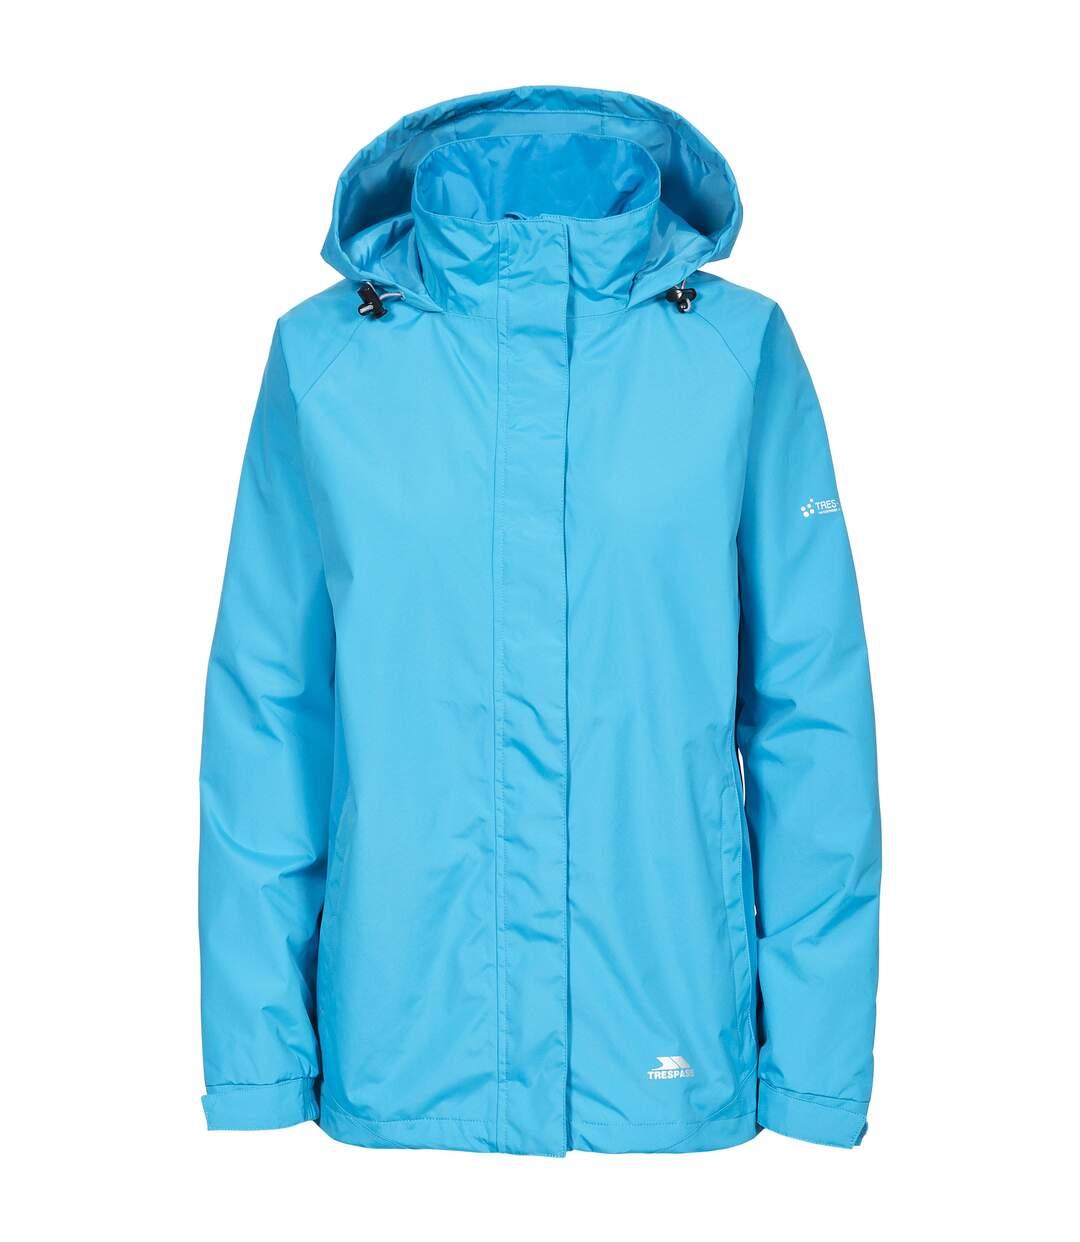 Trespass Womens/Ladies Tarron II Waterproof Shell Jacket (Bermuda) - UTTP3438